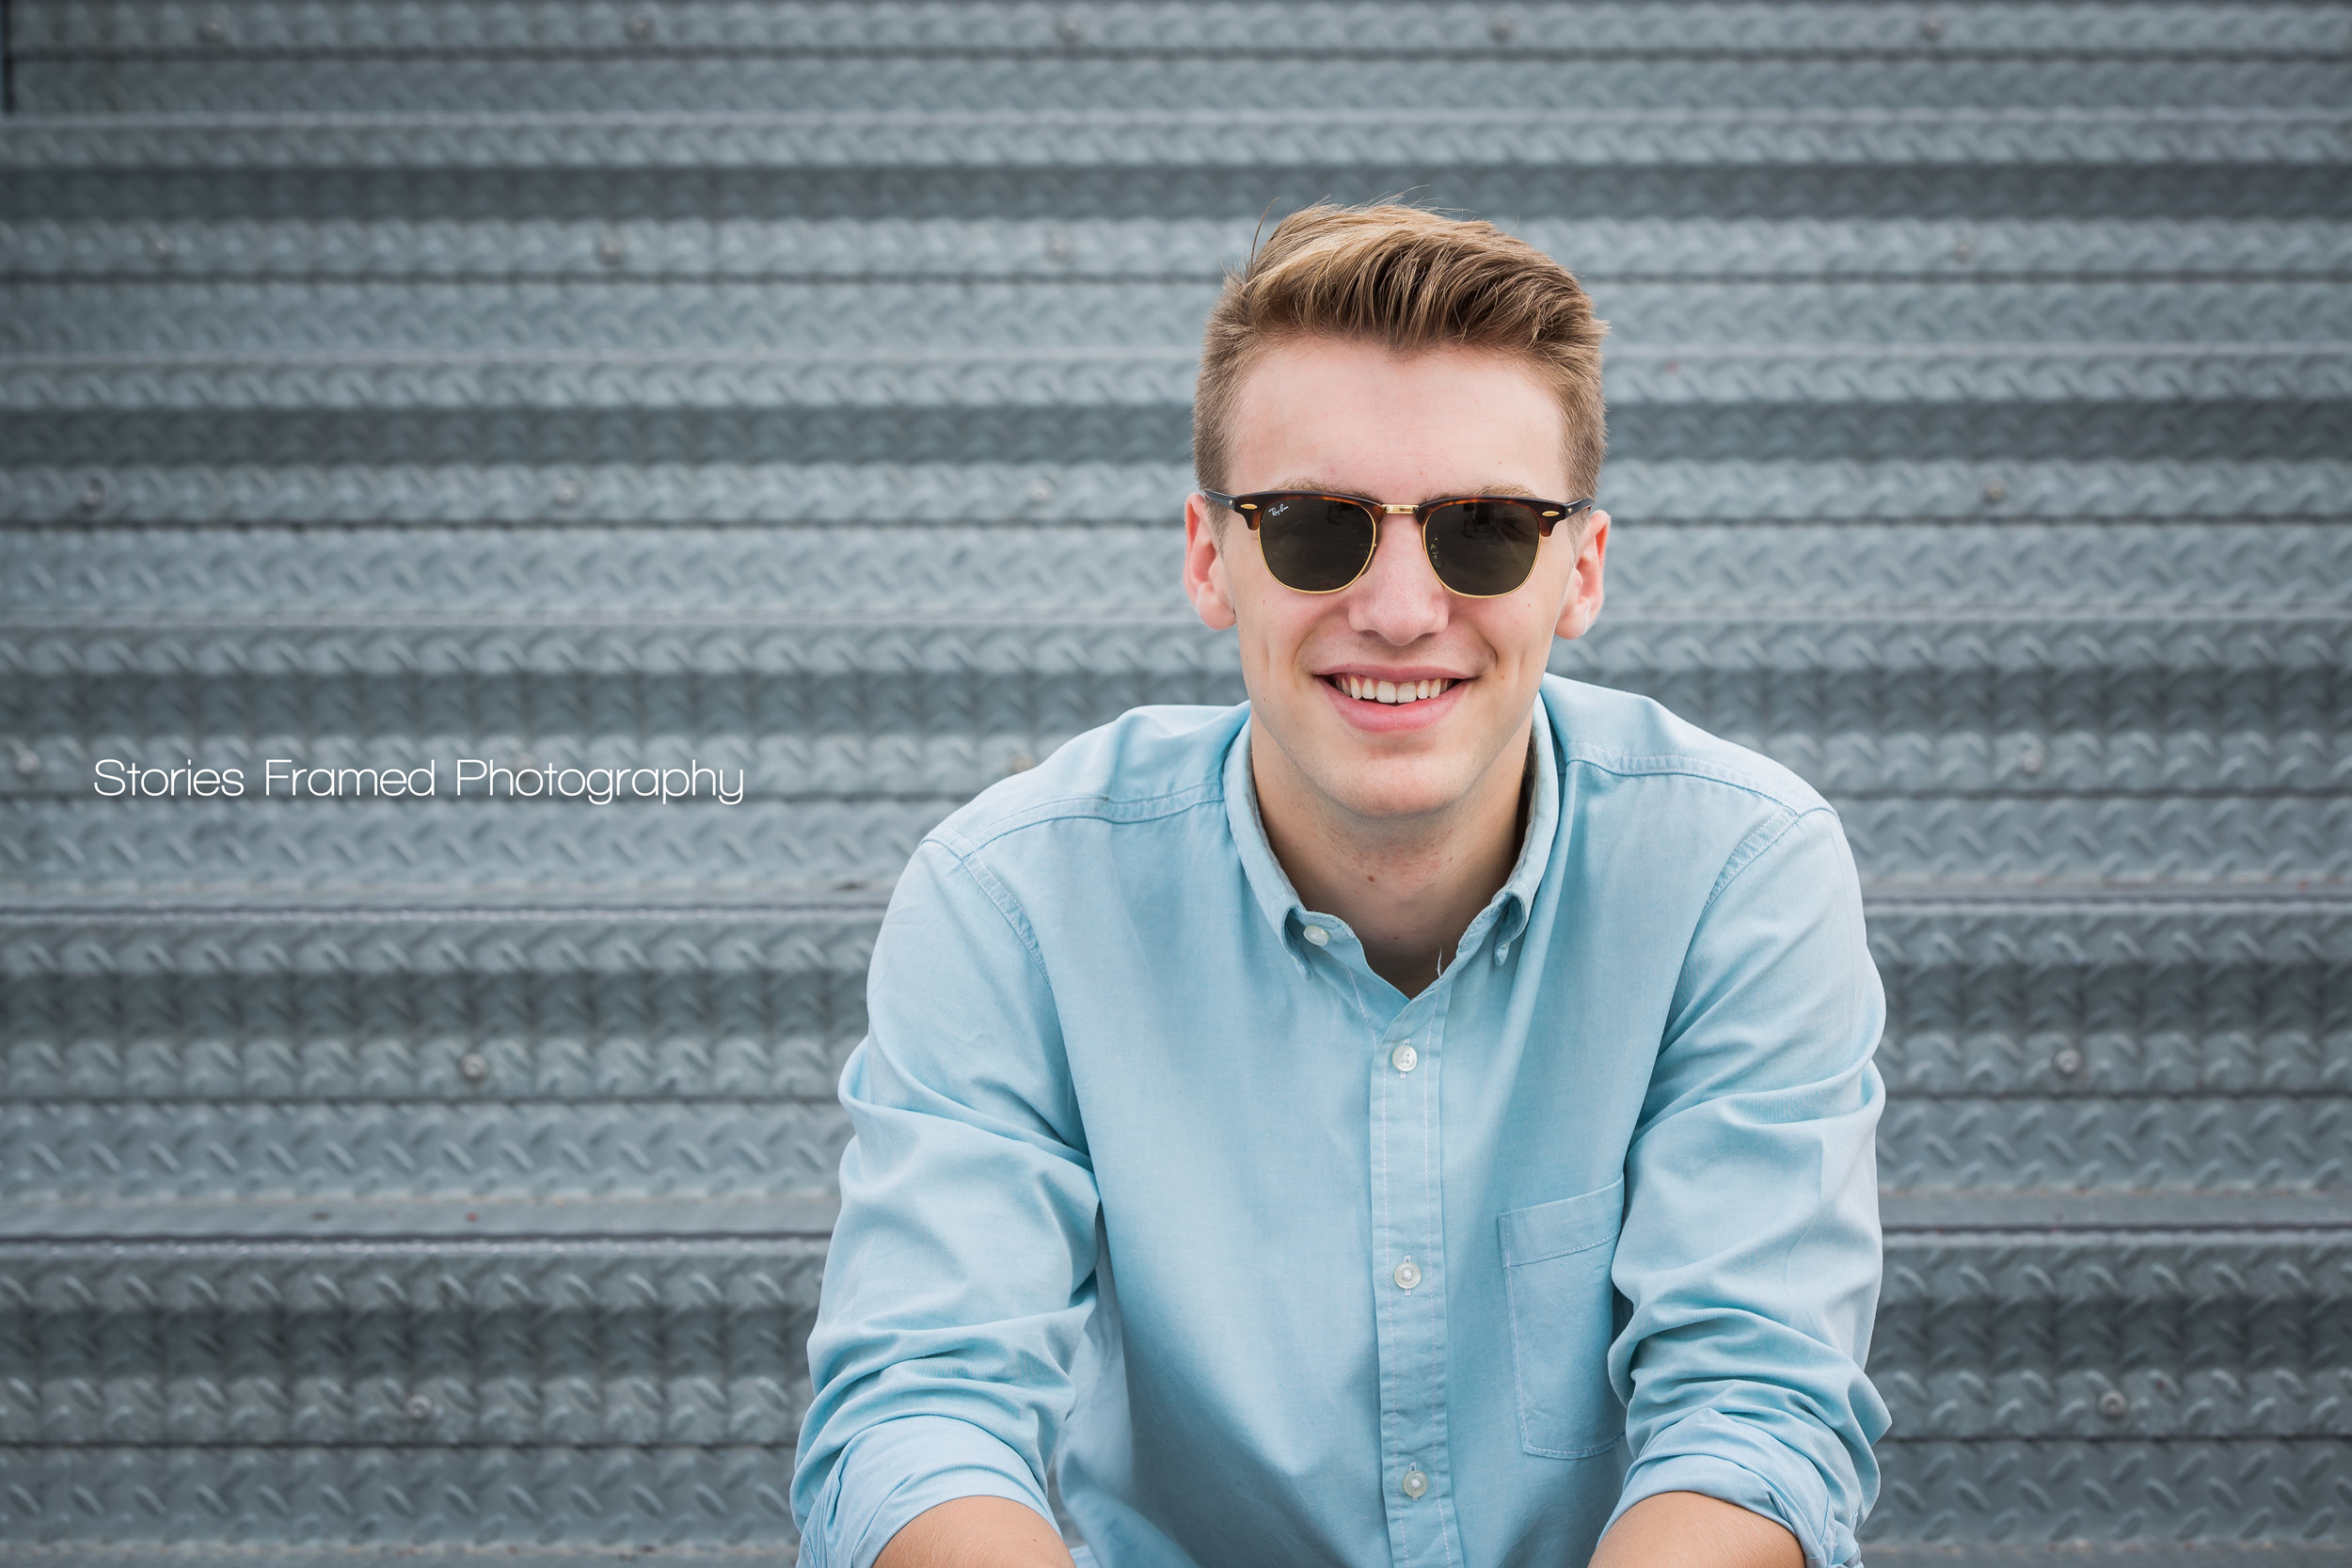 Joey-Greenfield-classof2017-seniorportraits-03.jpg